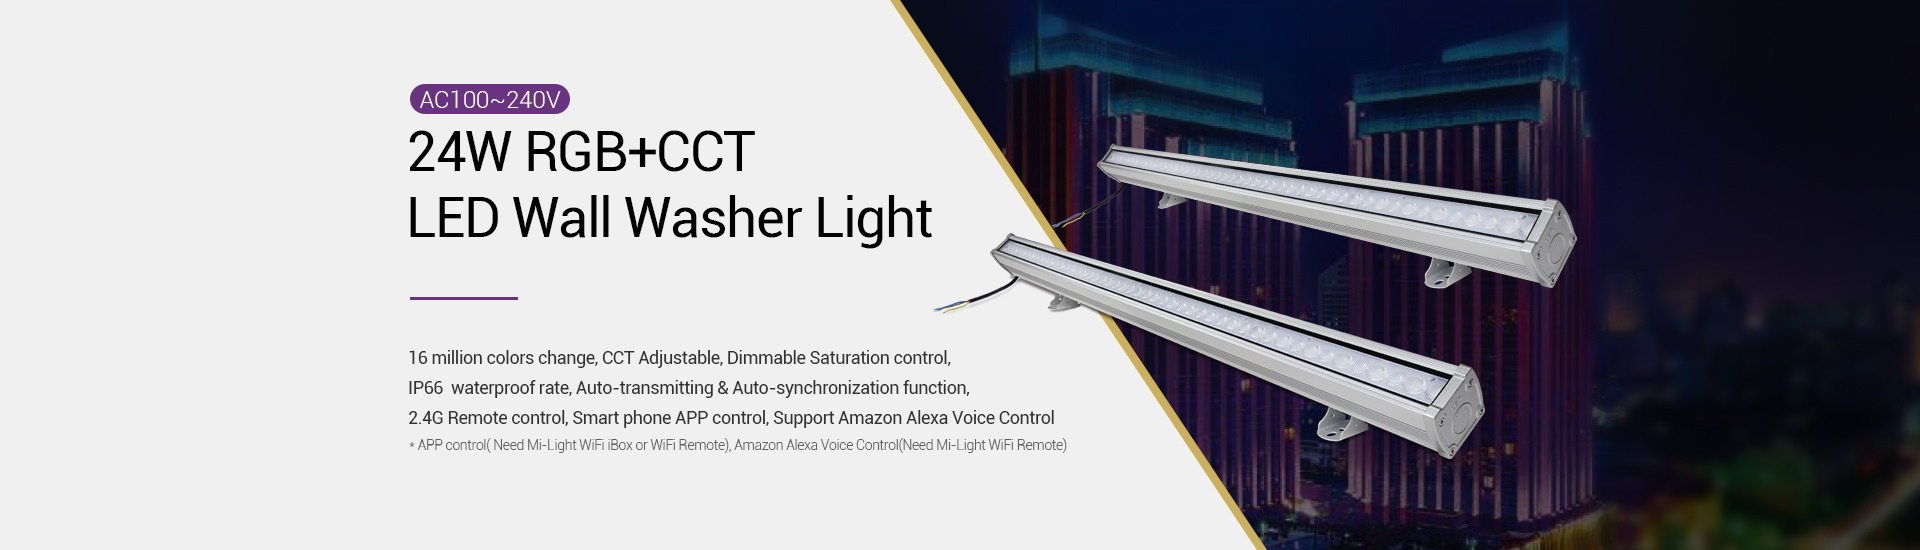 Shenzhen Futlight Optoelectronics Technology Co , Ltd  - LED